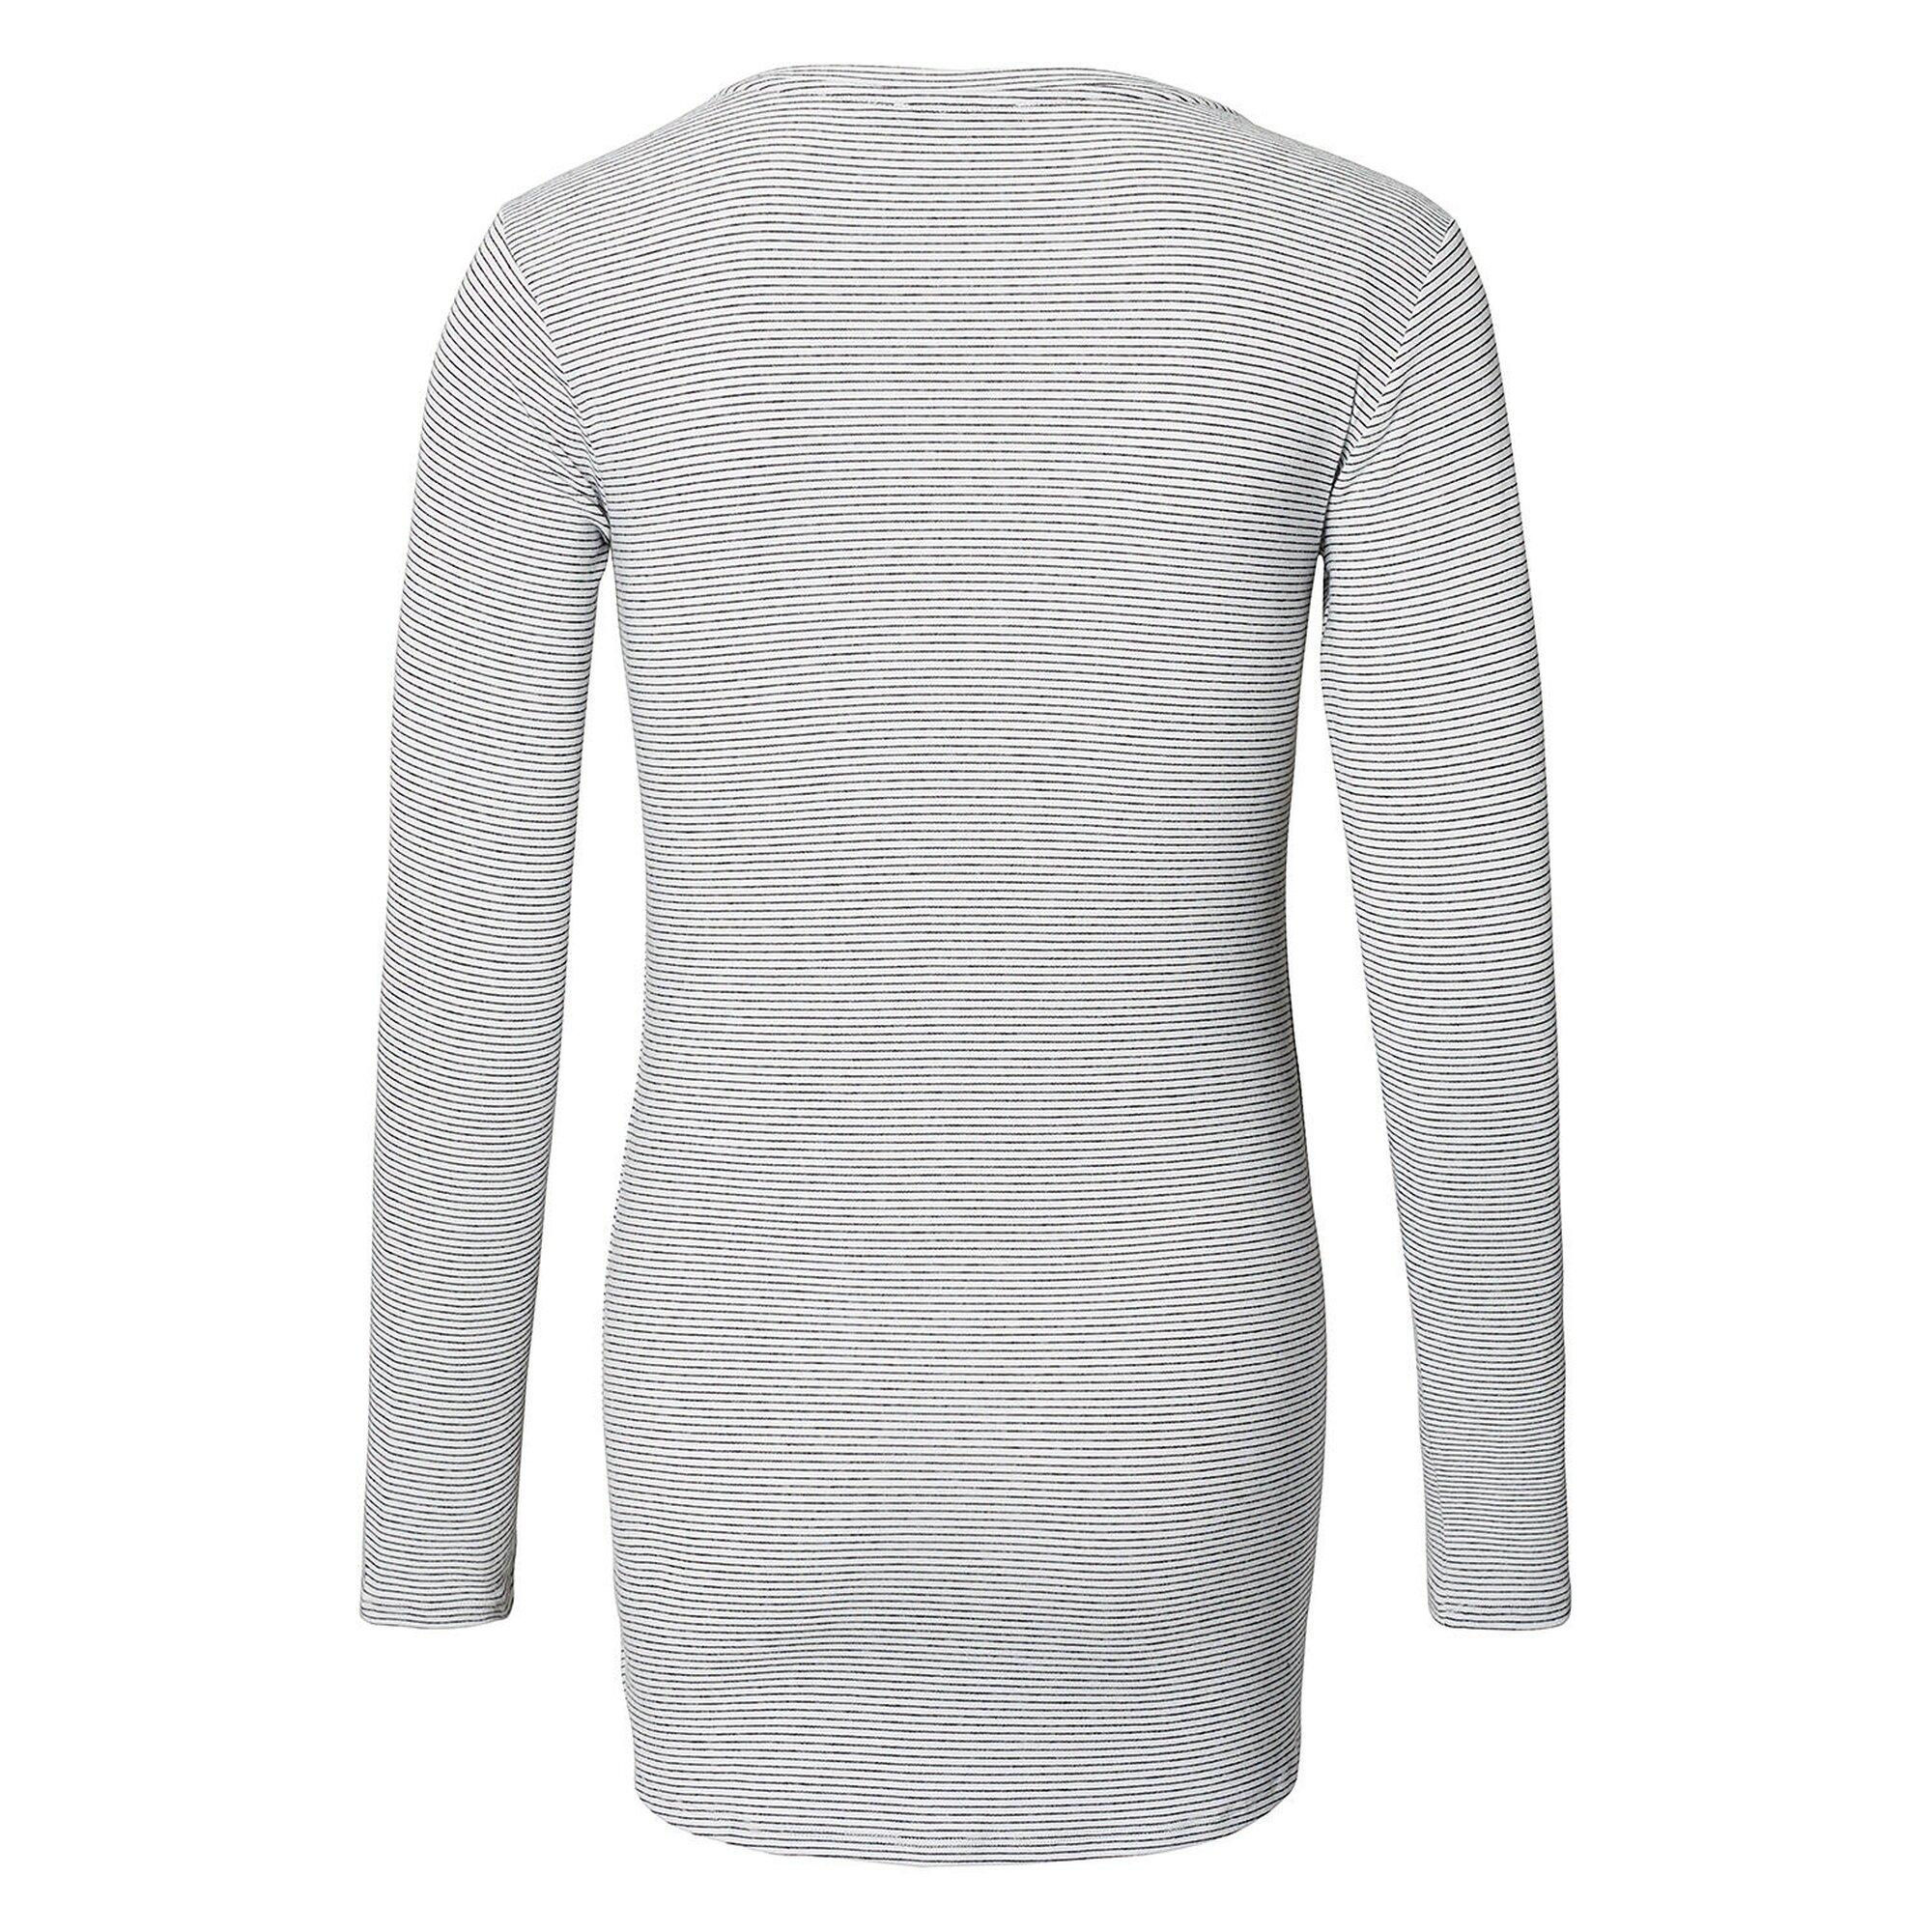 supermom-langarmshirt-print, 29.99 EUR @ babywalz-de